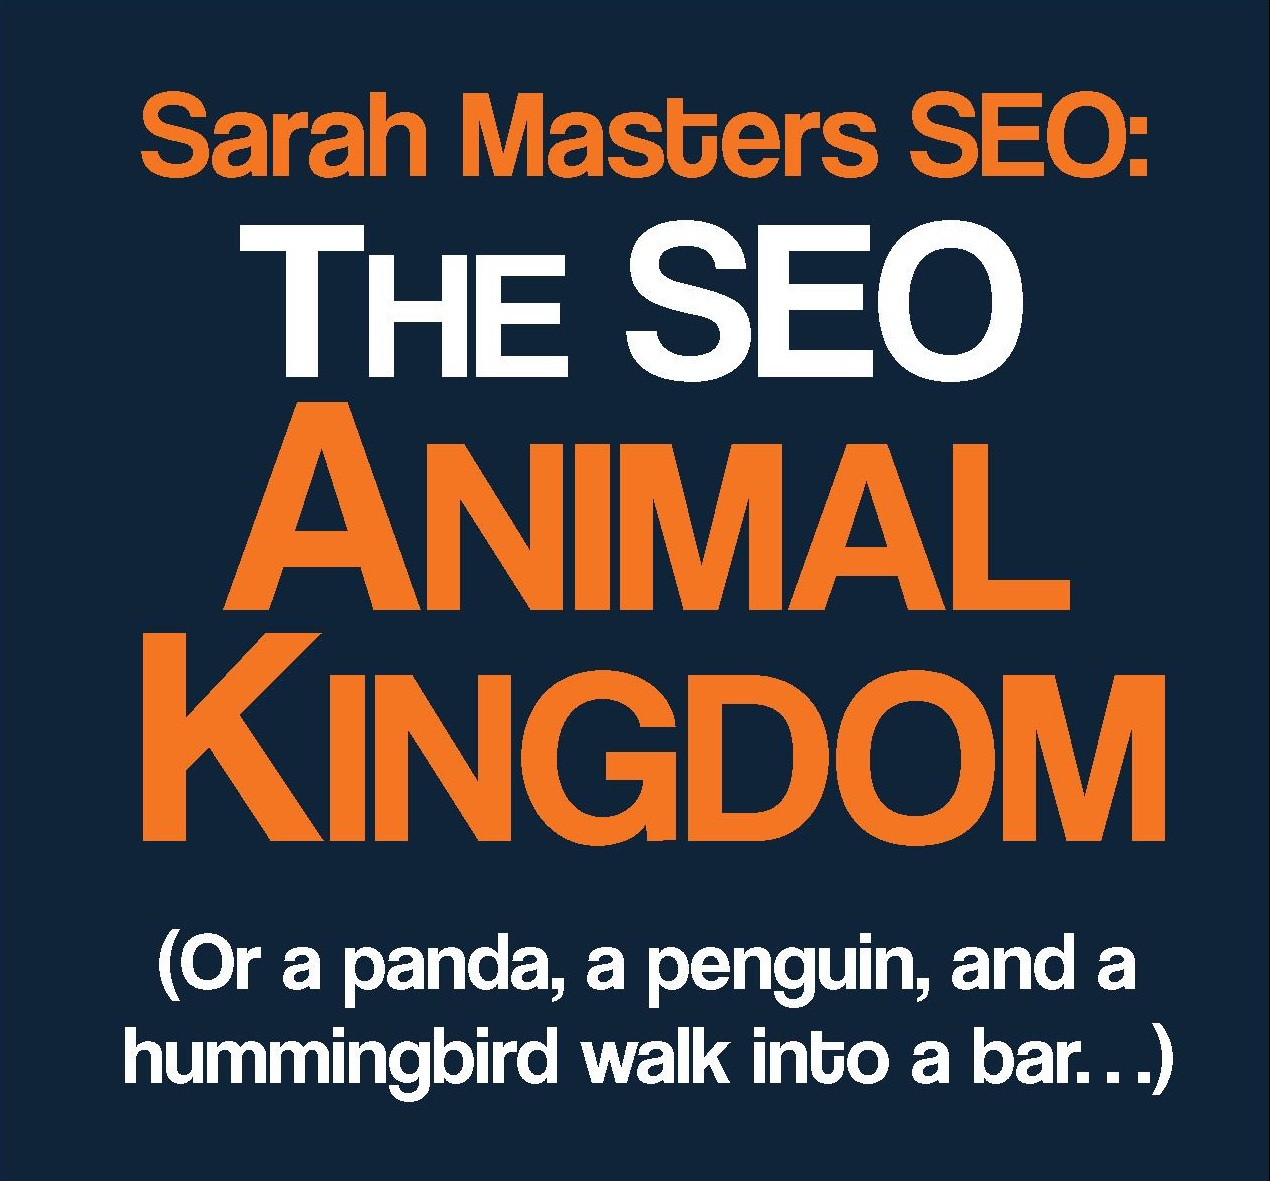 The SEO Animal Kingdom